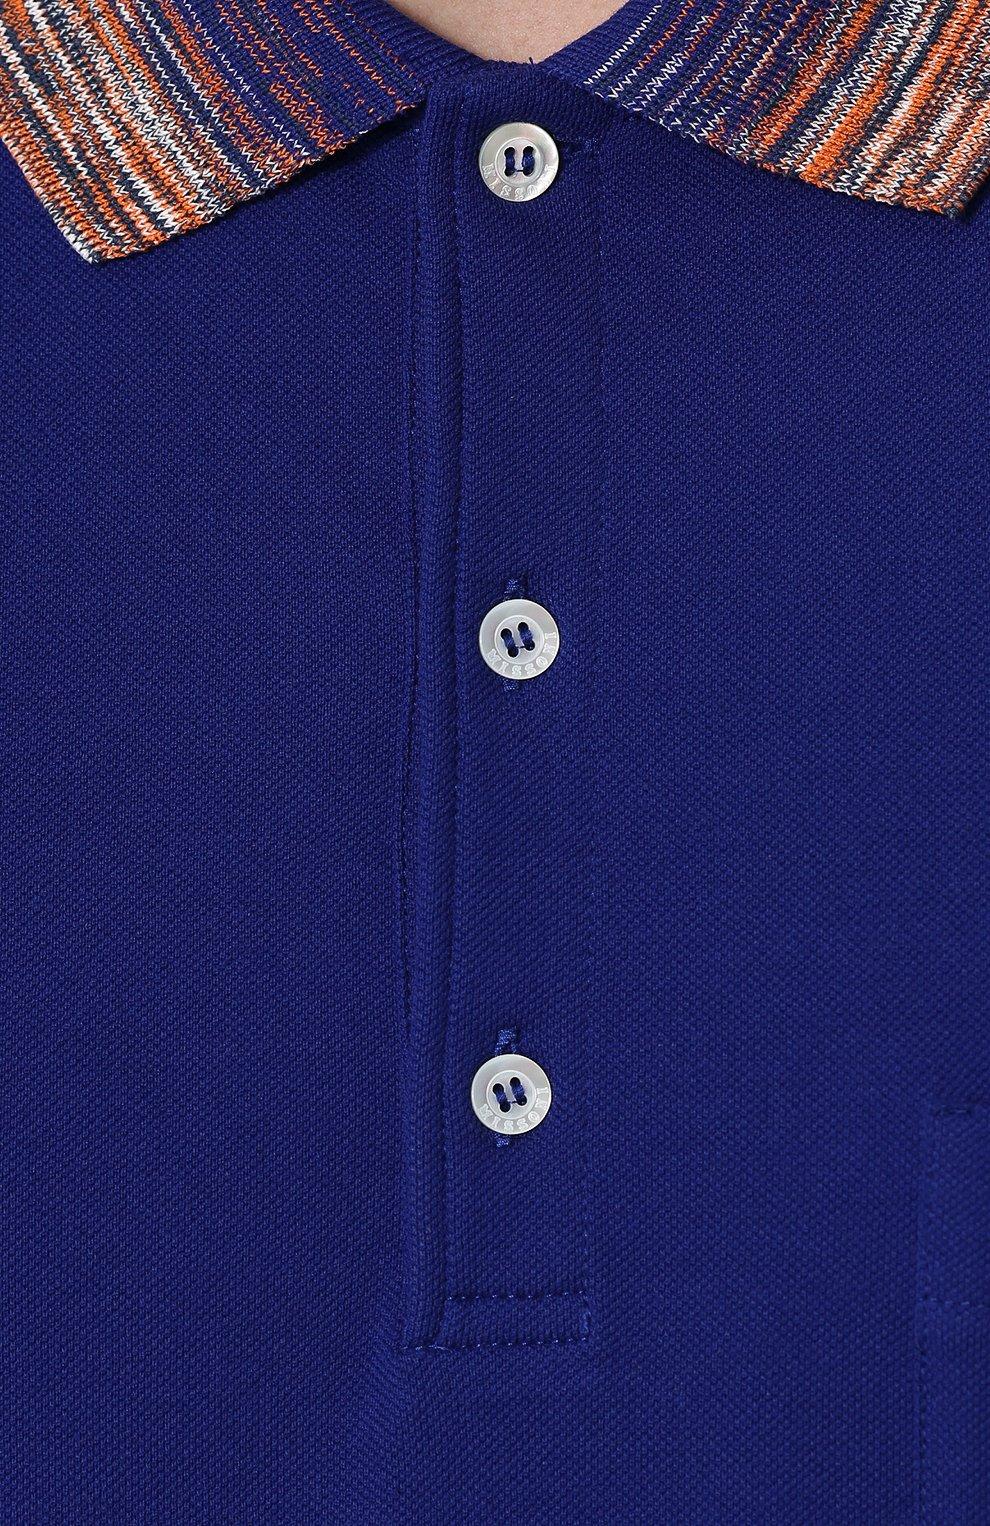 Хлопковое поло с короткими рукавами Missoni синее   Фото №5